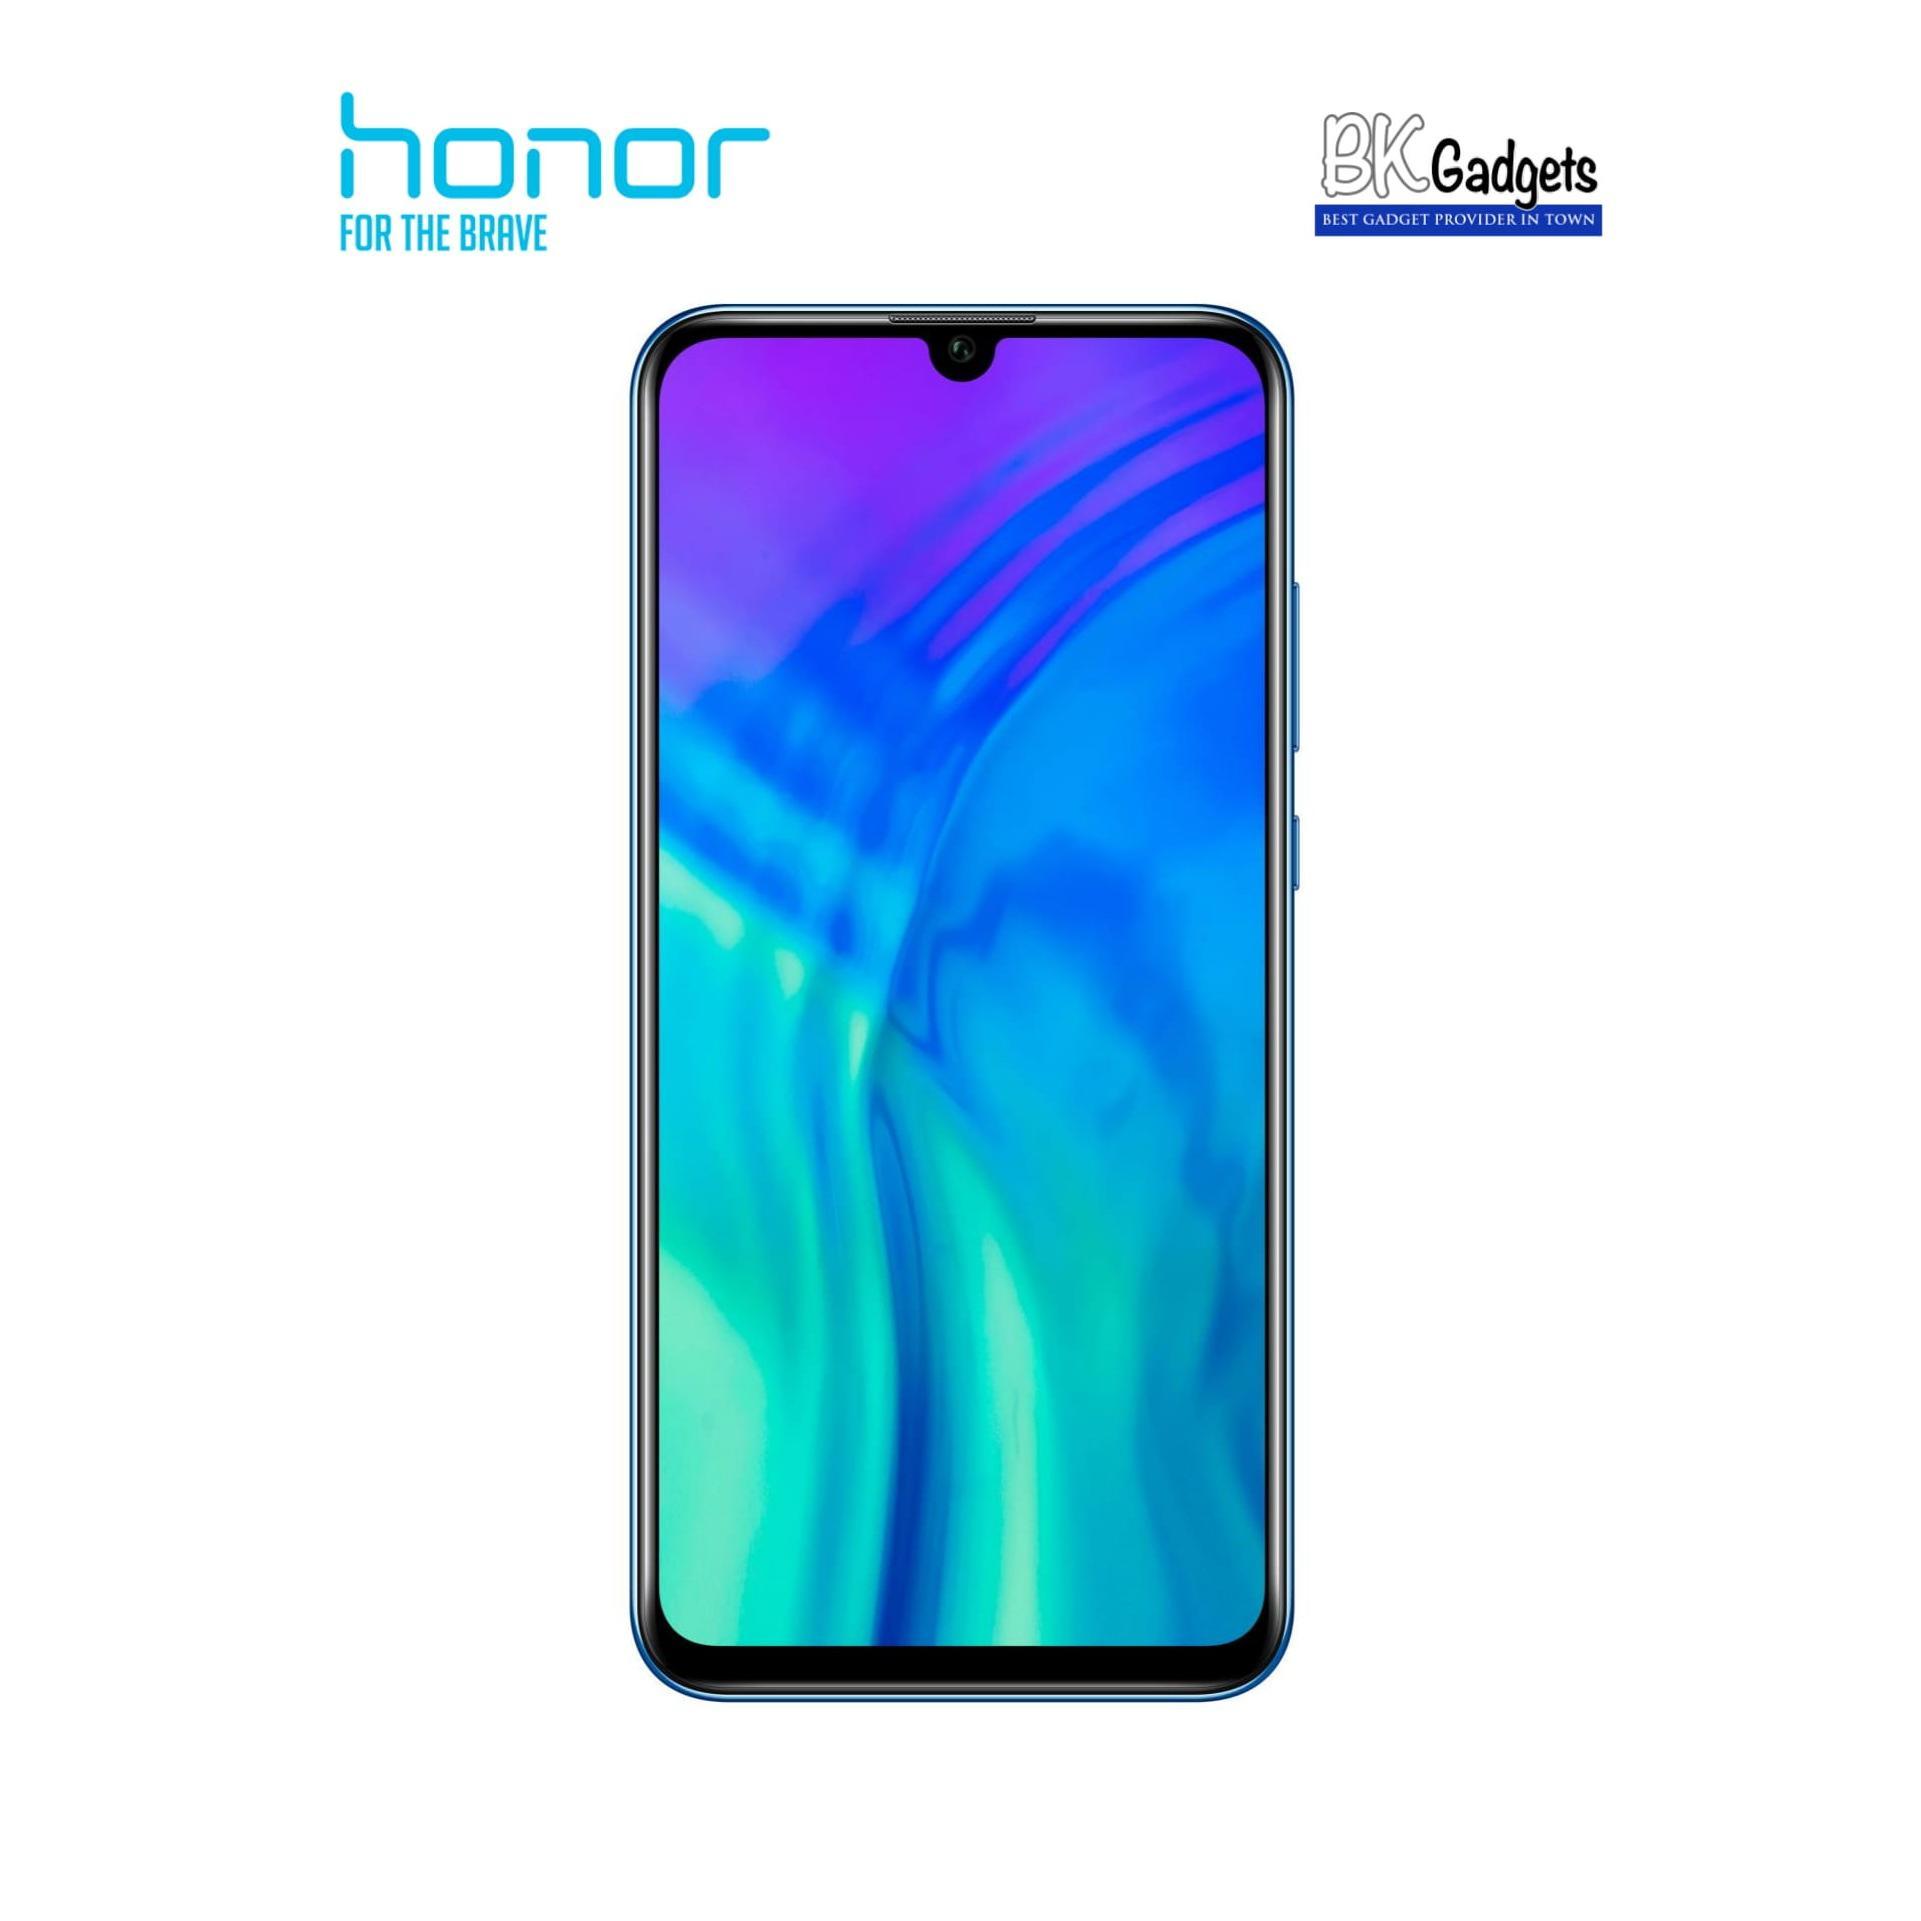 Honor 20 Lite 4/128GB Phantom Blue - Original from Honor Malaysia 1 Year Warranty